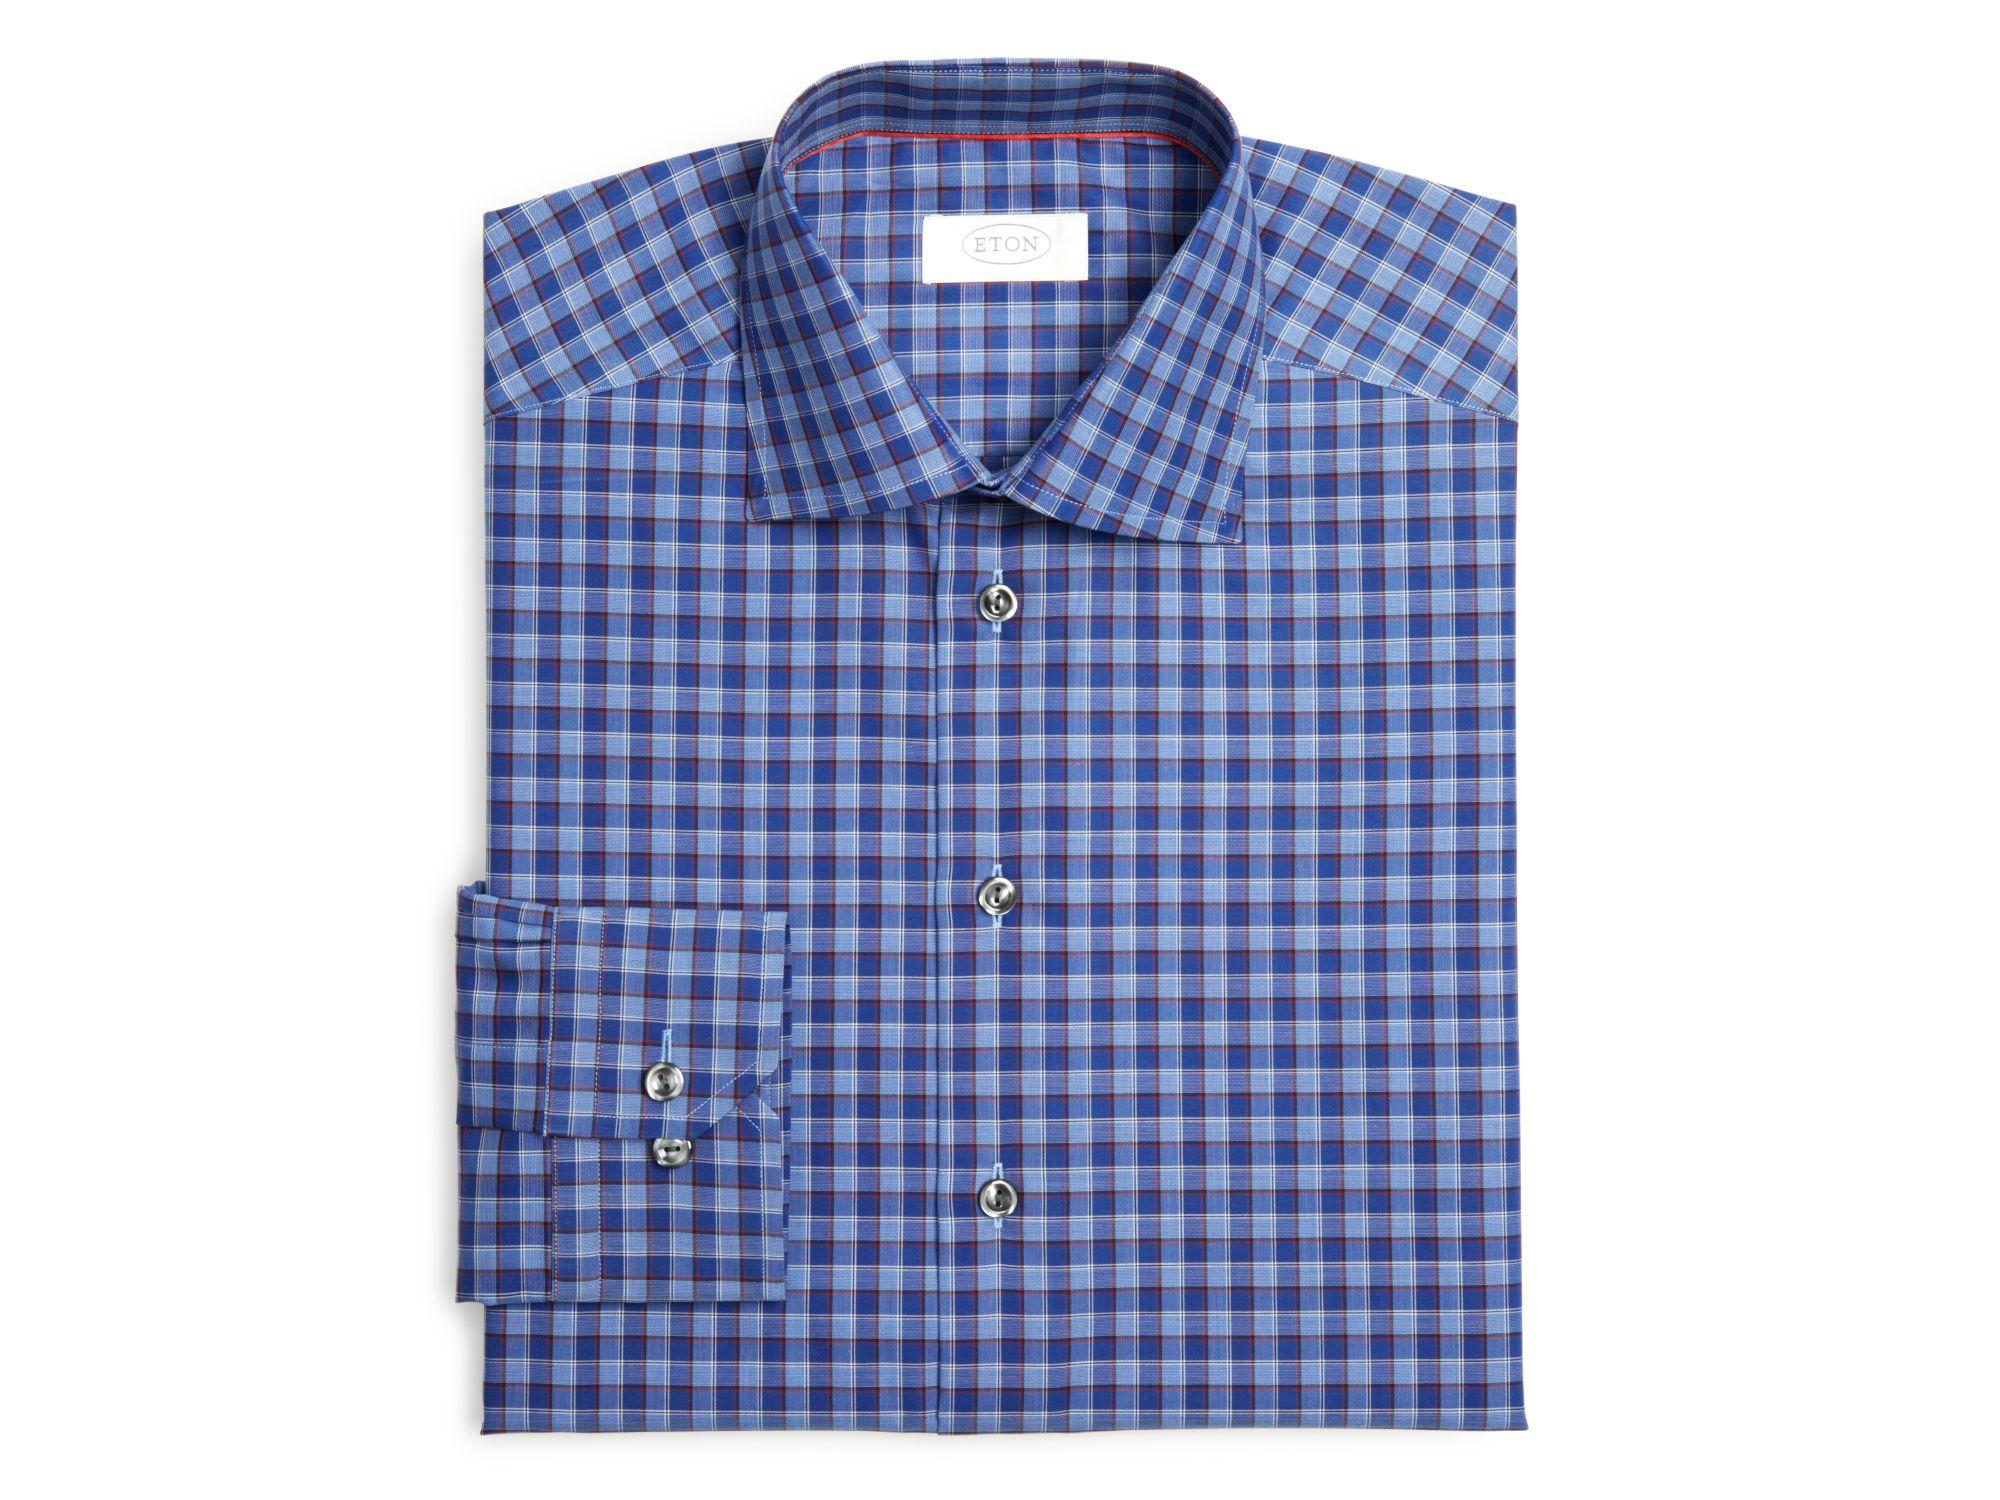 Lyst eton of sweden plaid regular fit dress shirt in blue for Regular fit dress shirt